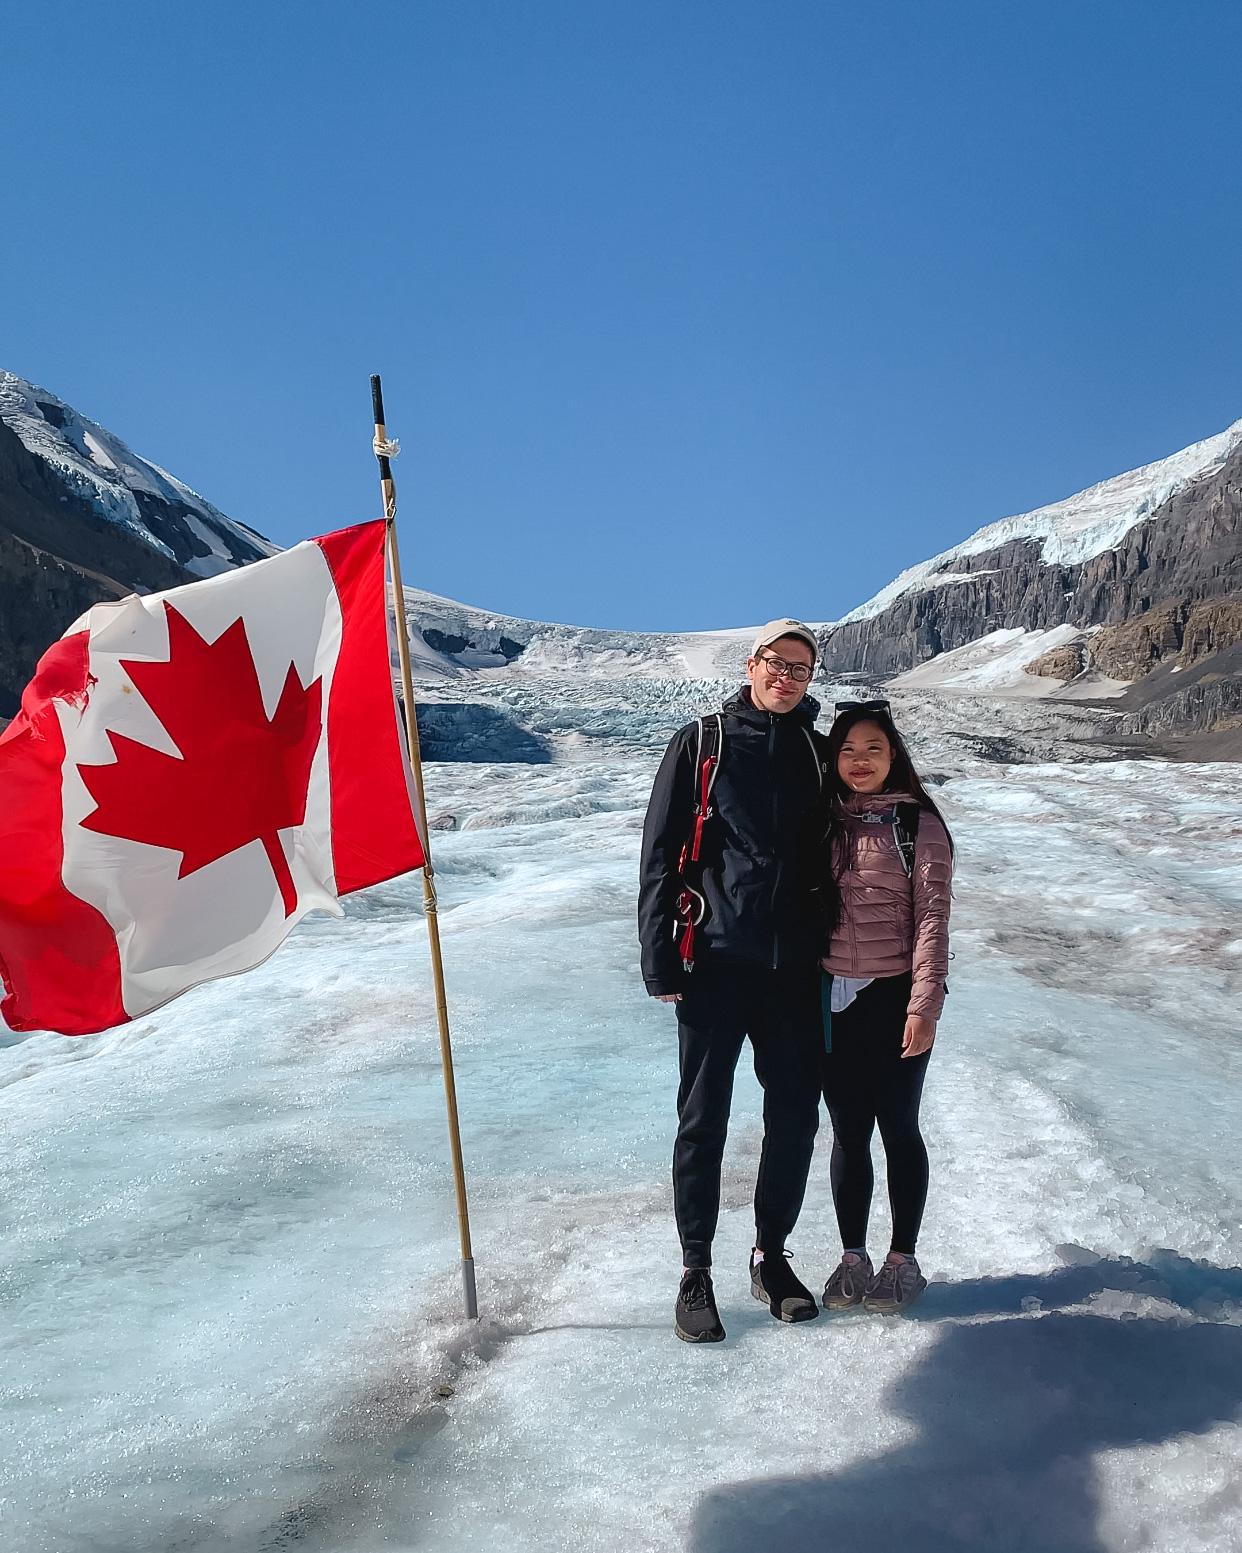 Columbia Icefield Glacier Adventure in Jasper National Park, Alberta